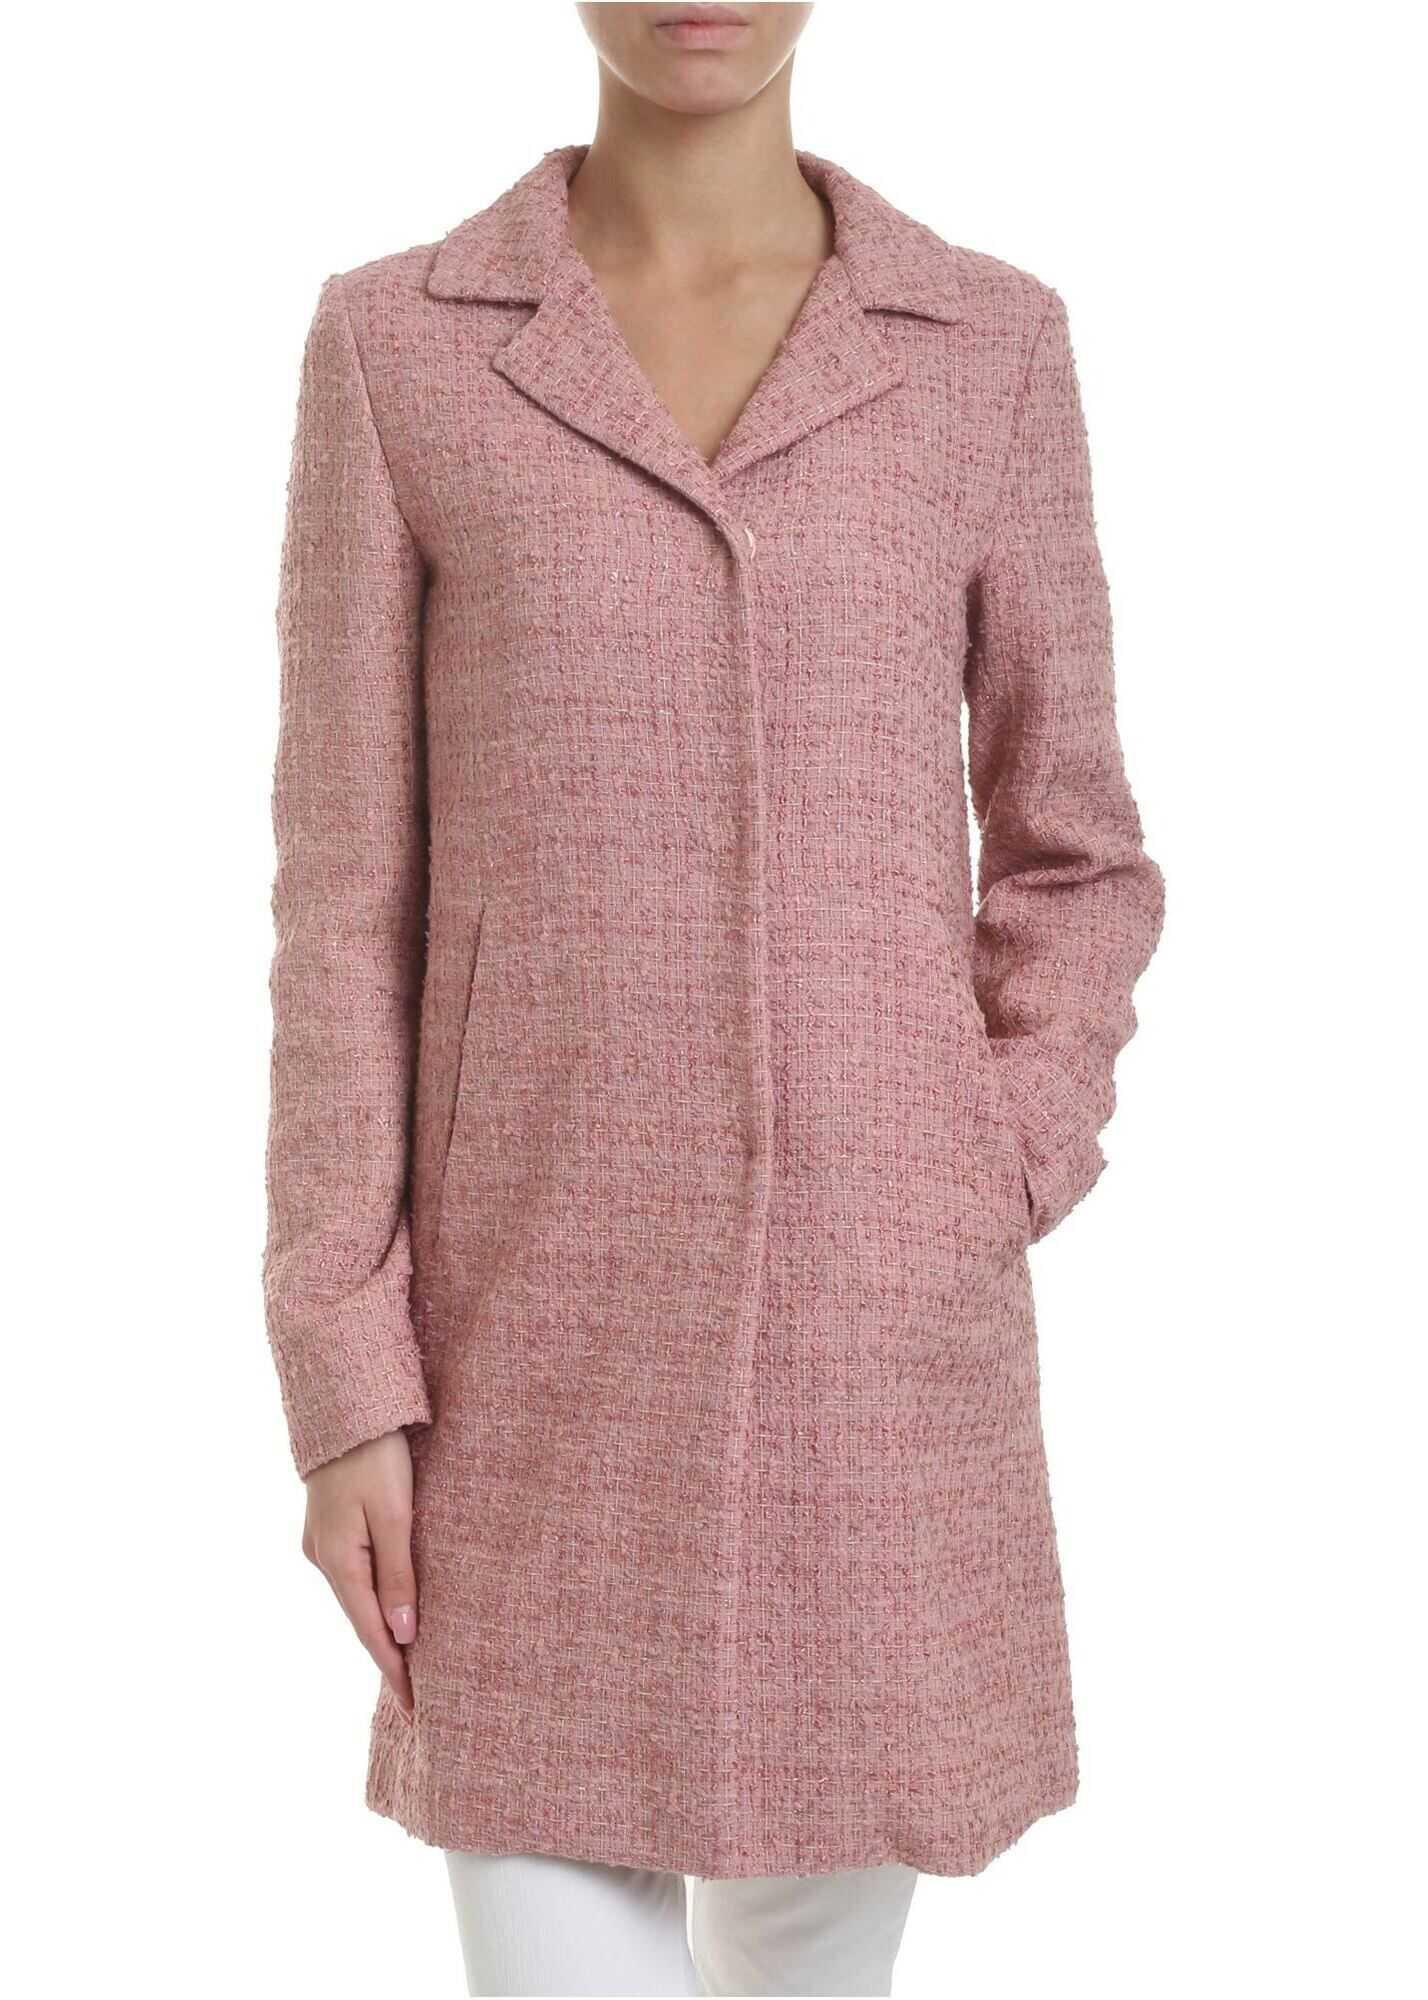 Bouclé Coat In Pink With Lamé Inserts